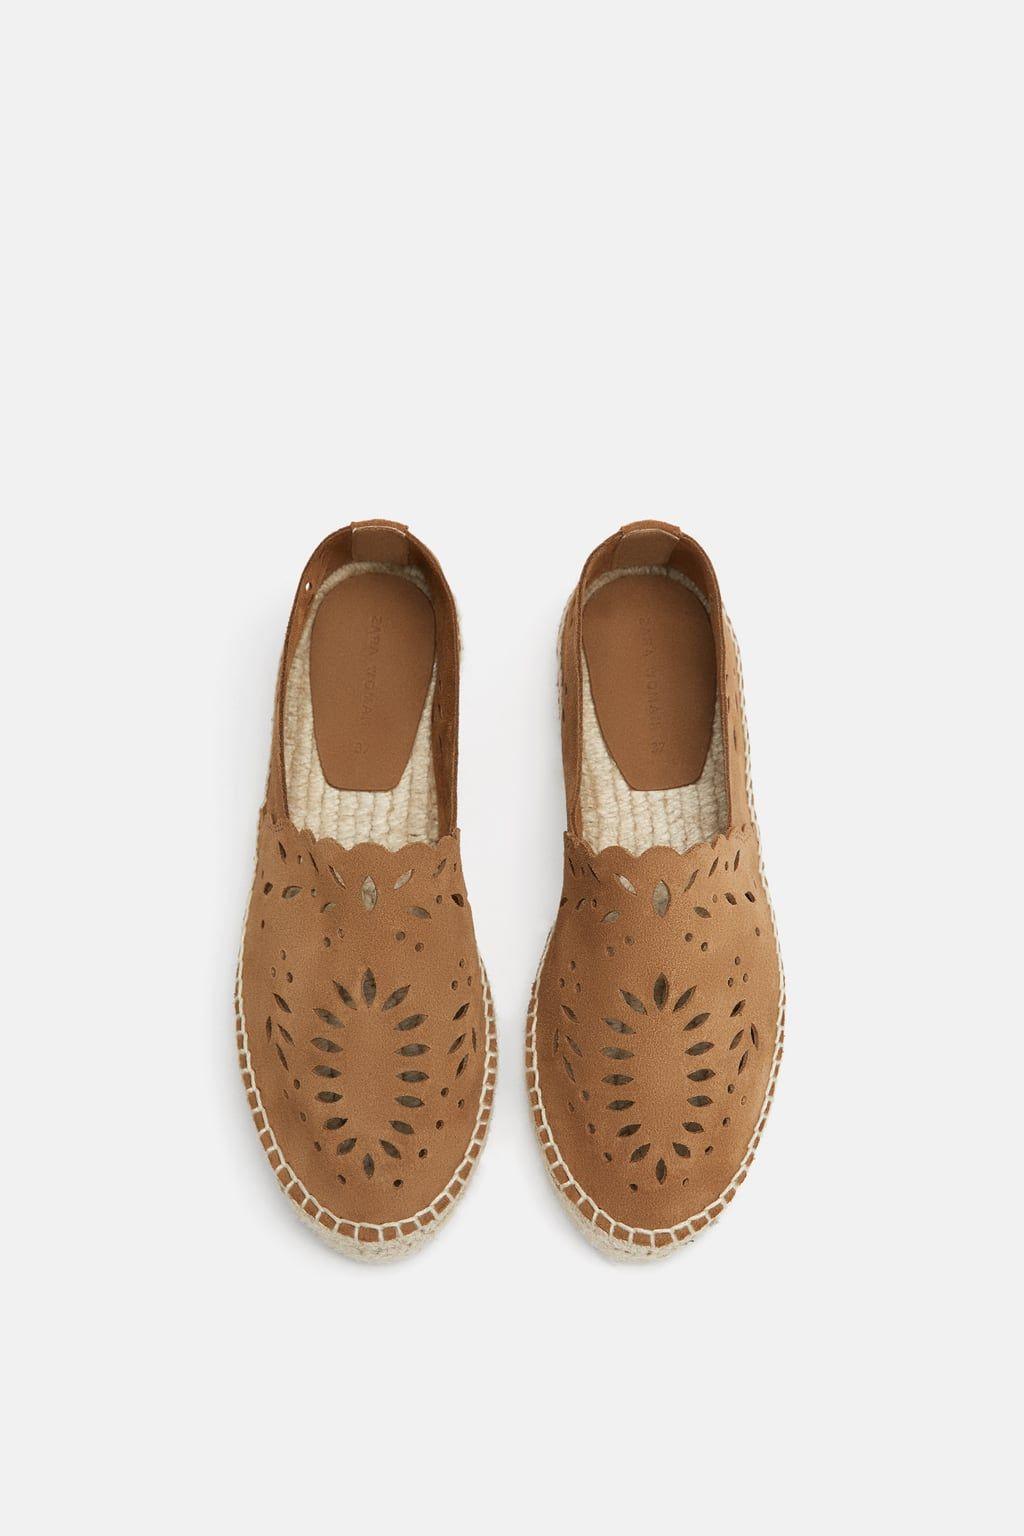 988b18561 ZARA - WOMAN - OPENWORK LEATHER ESPADRILLES Leather Espadrilles, Loafer  Flats, Leather Shoes,